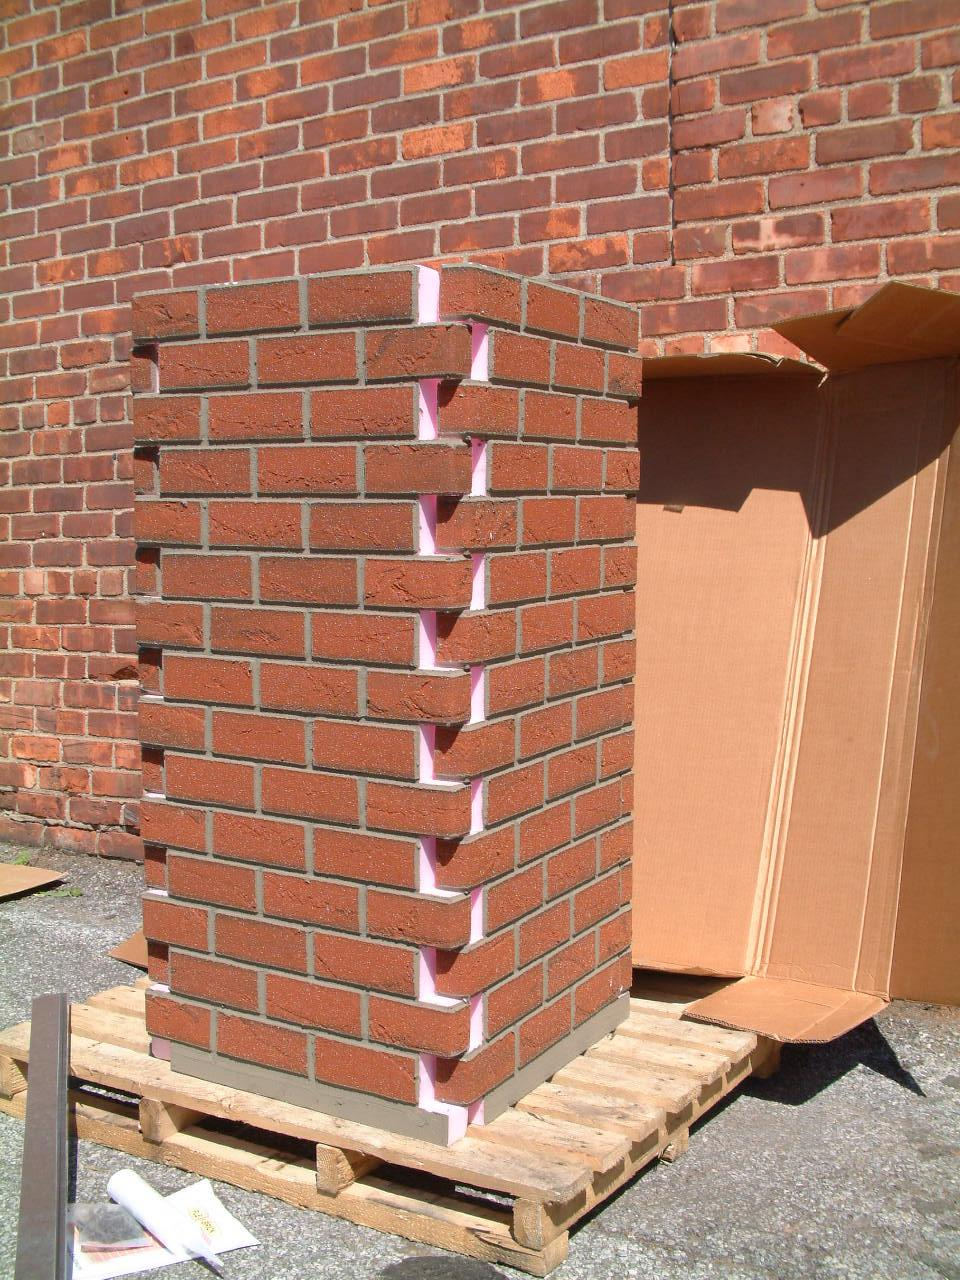 Flexi Brick Source Simulated Brick Chimney Chase Light